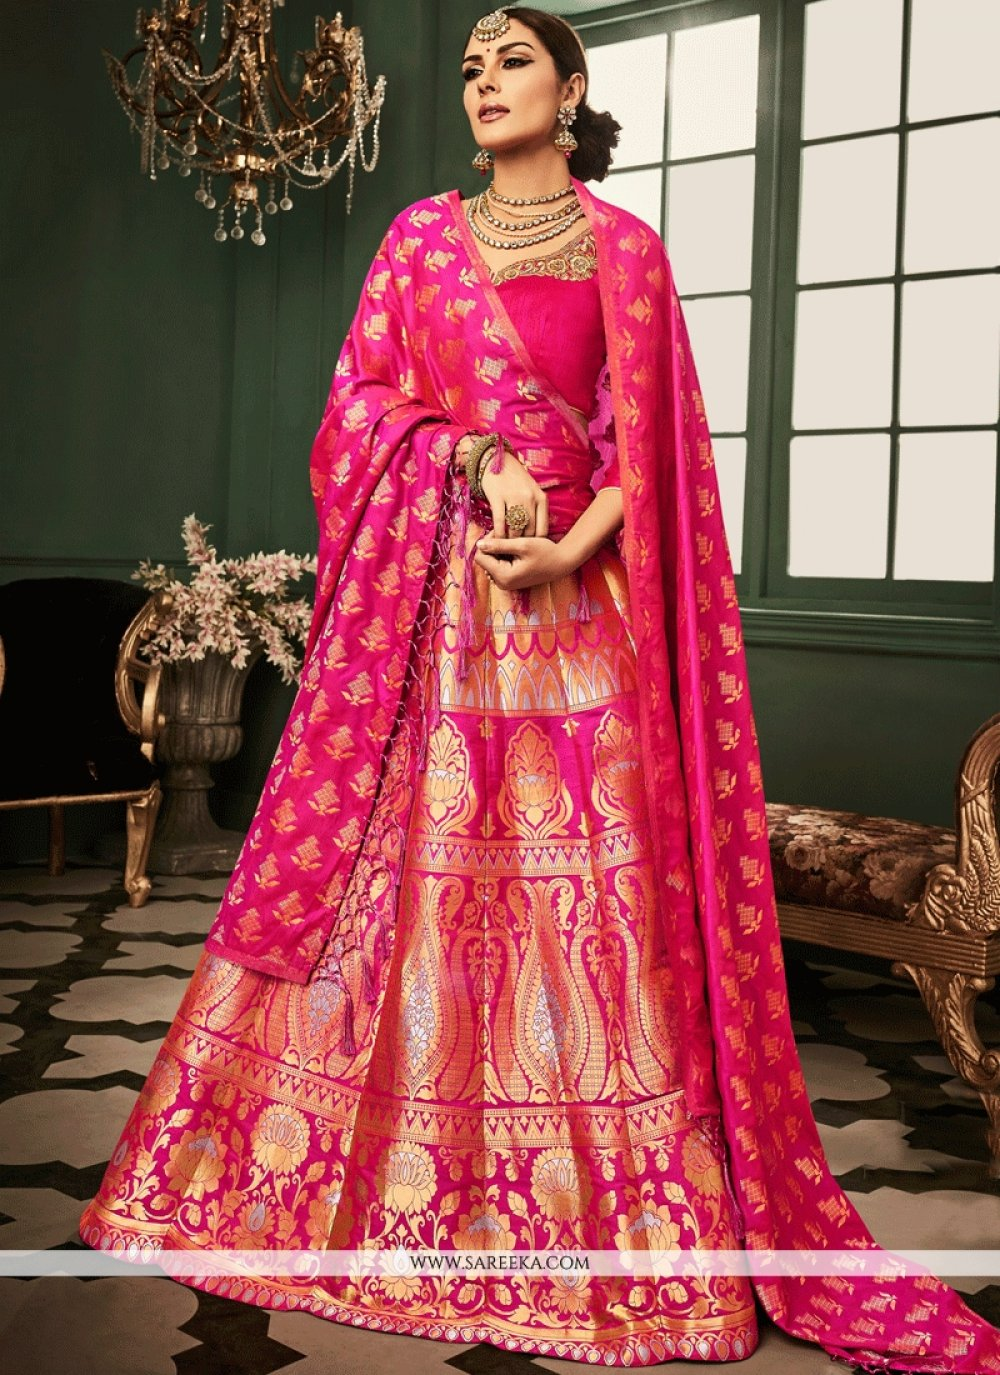 Banarasi Silk Hot Pink Weaving Work Lehenga Choli